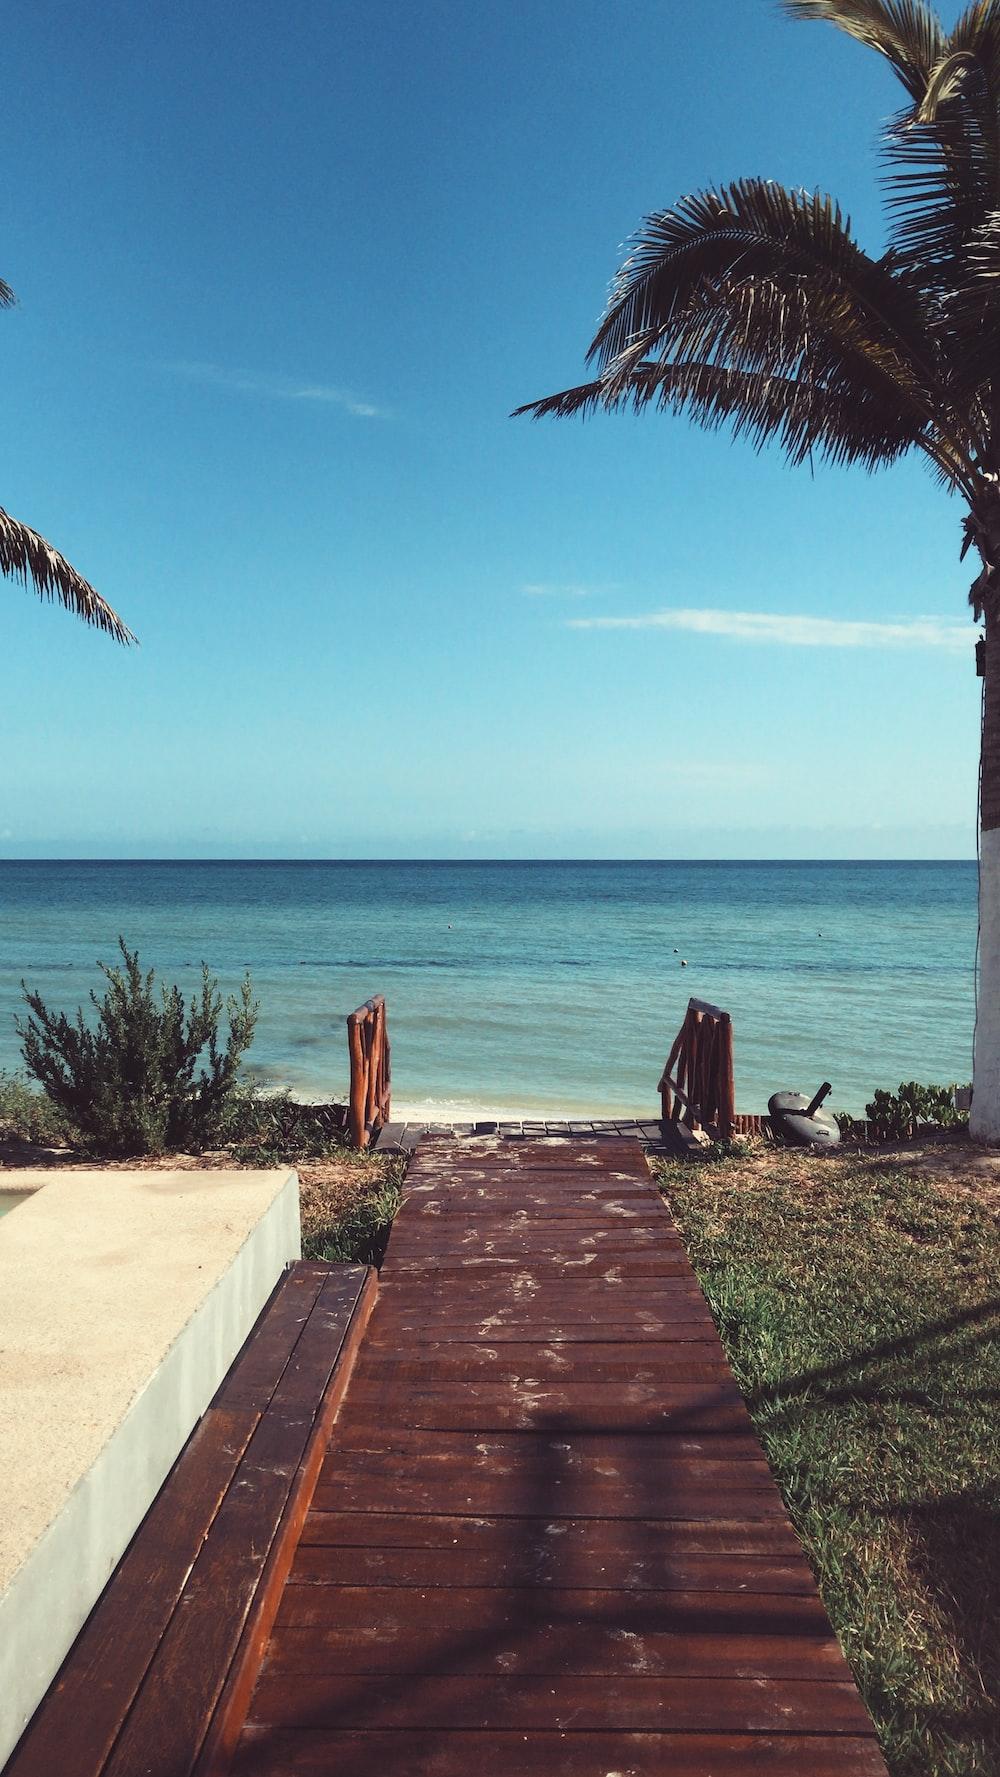 brown wooden pathway on beach during daytime